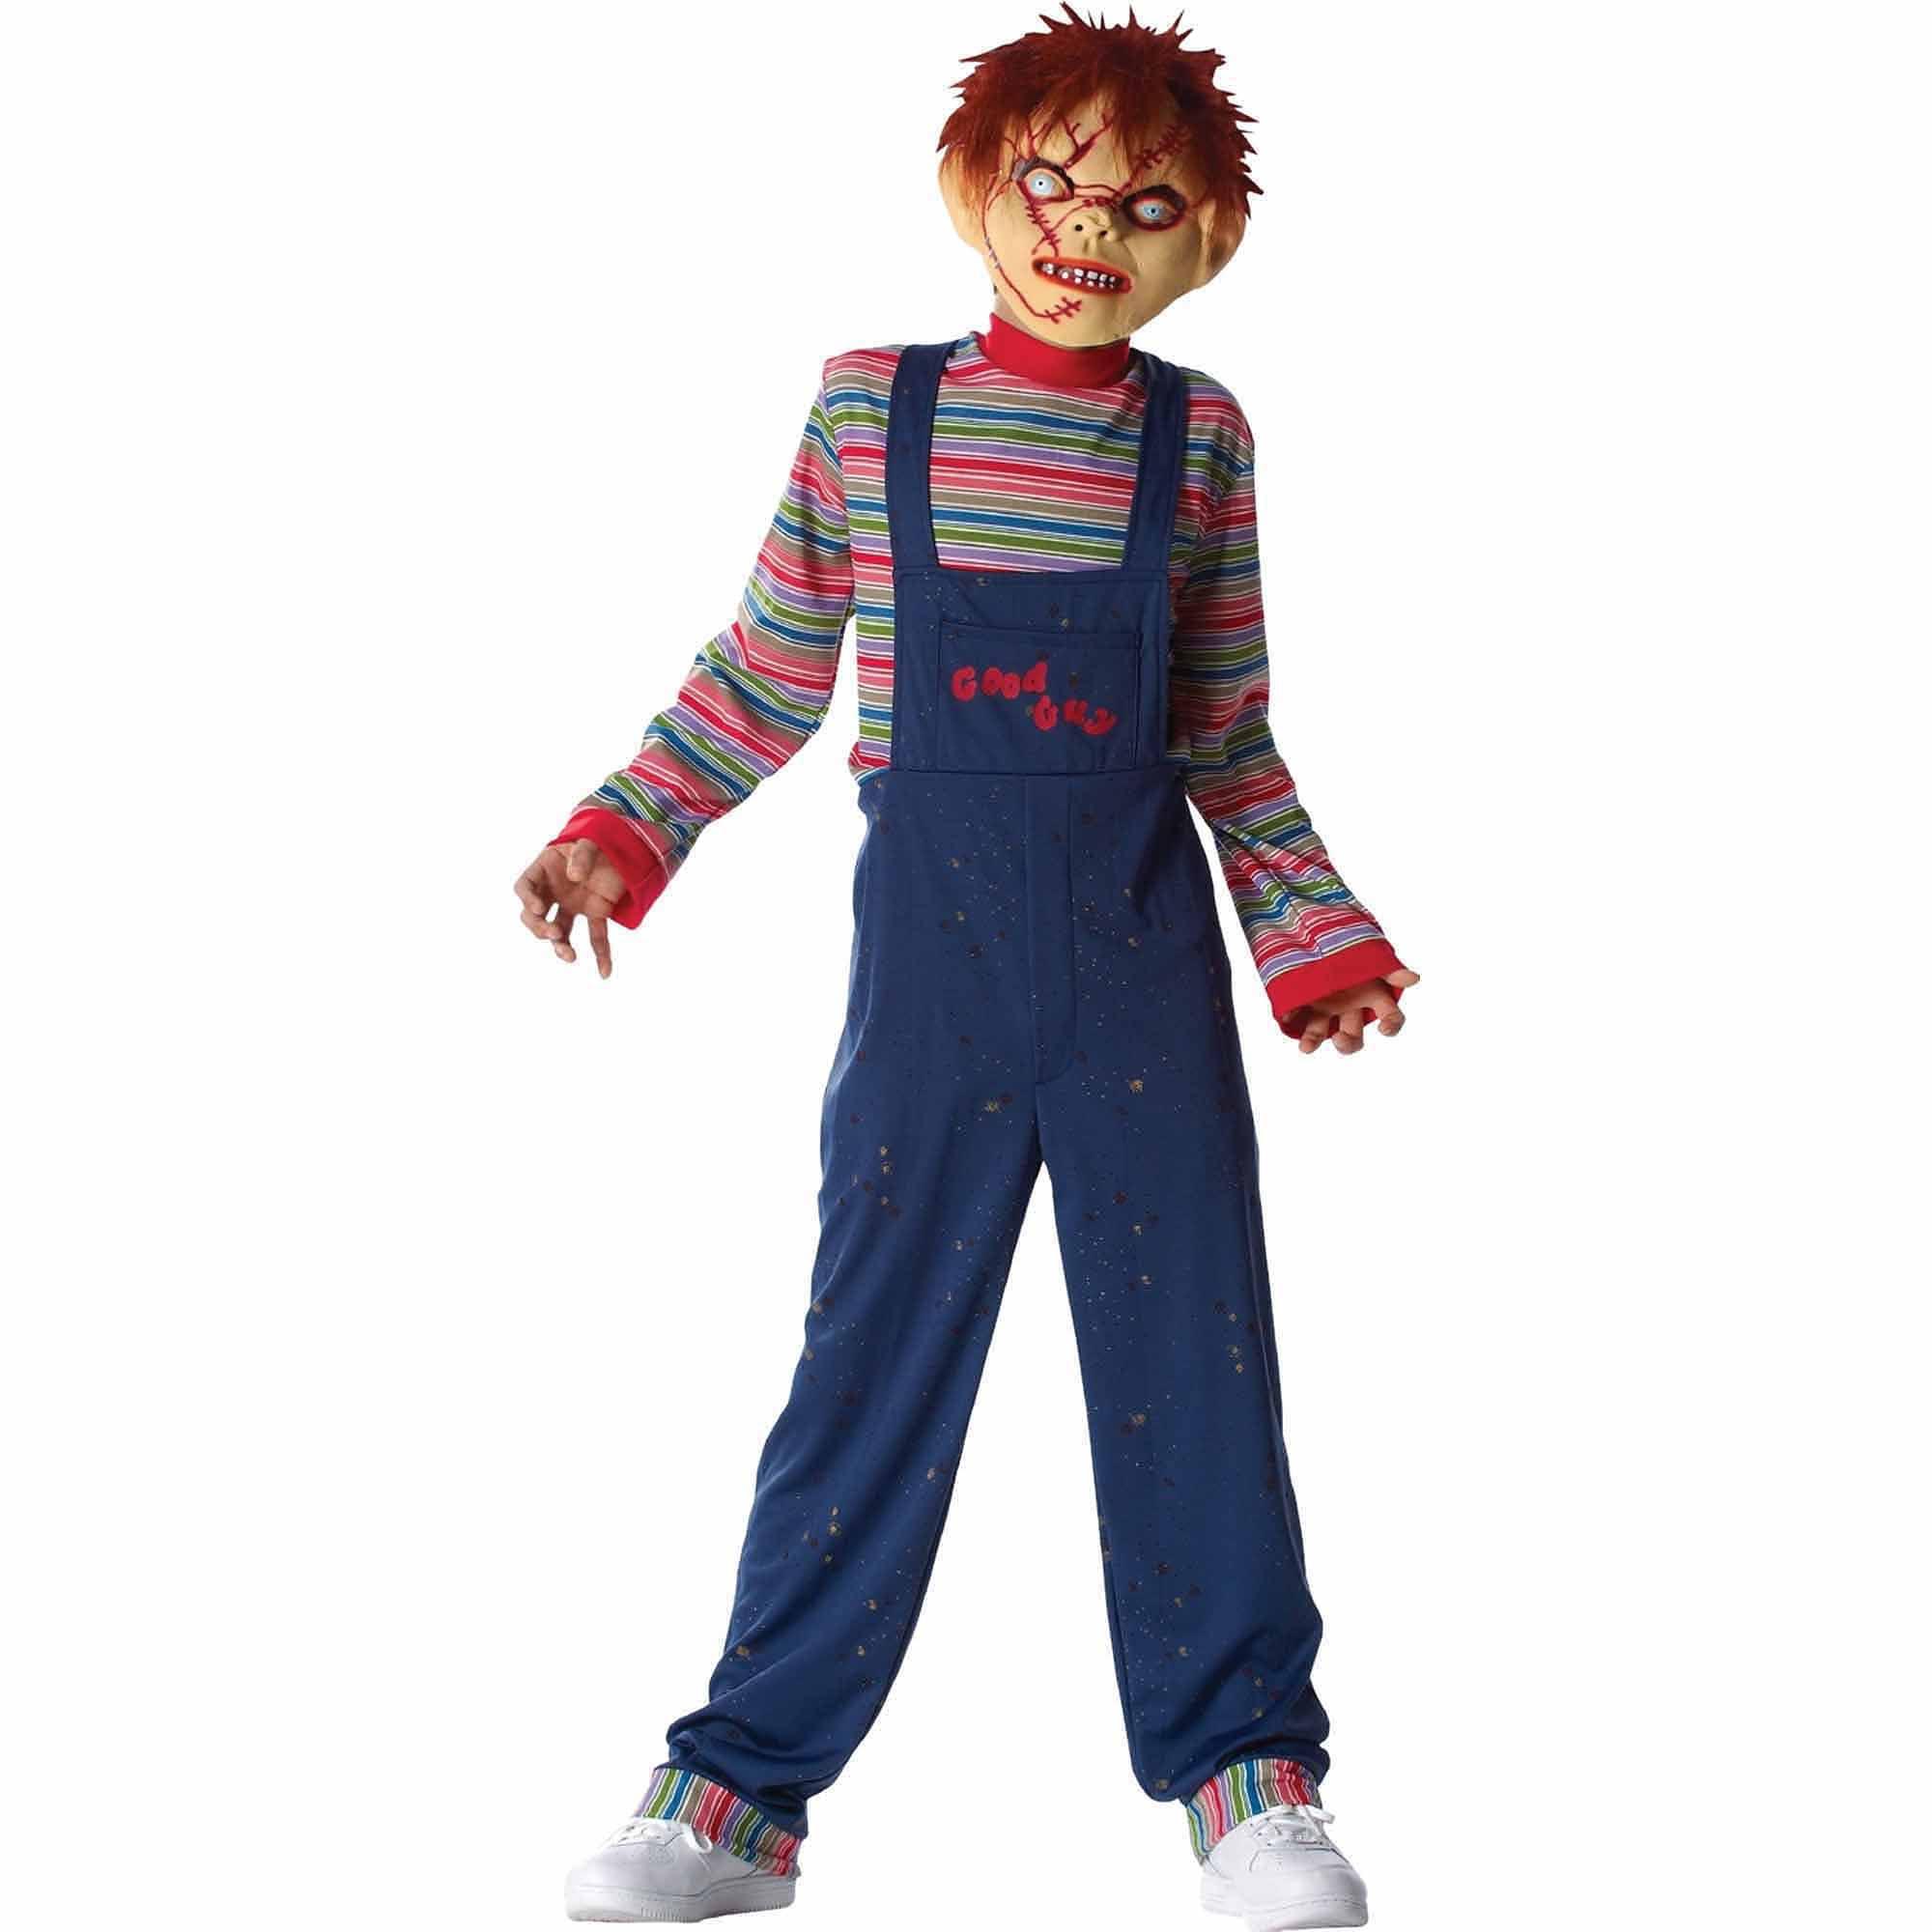 chucky child halloween costume - walmart